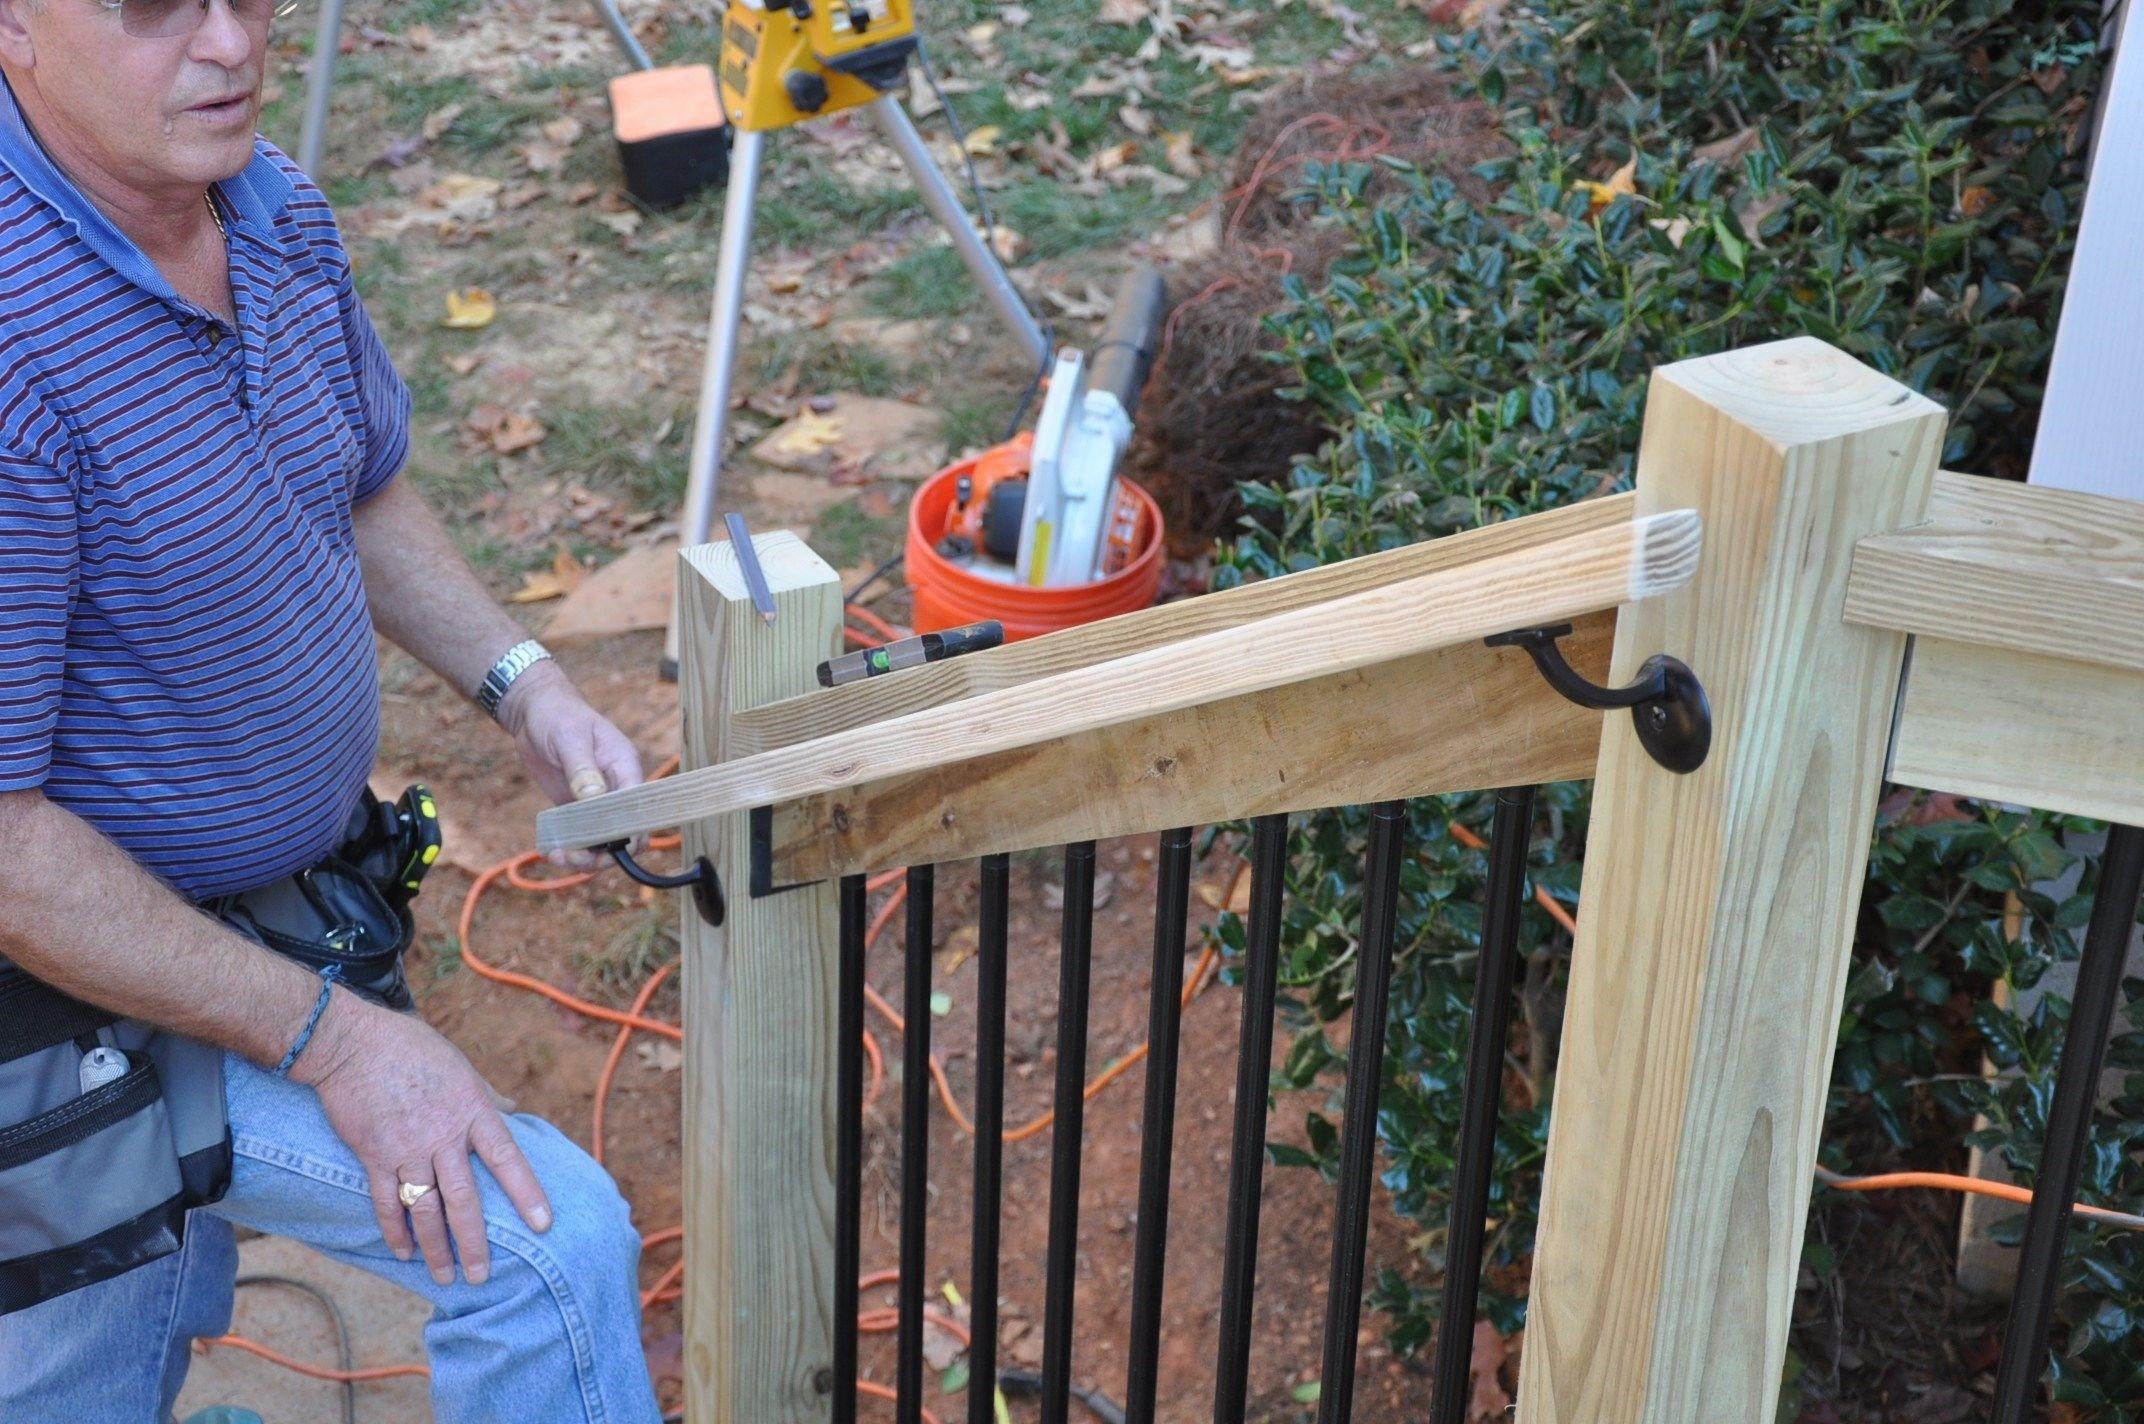 How To Install Deck Stair Railings Decks Com | Pressure Treated Stair Handrail | Sturdy | Step | Deck Rail | Long Deck | Treated Lumber